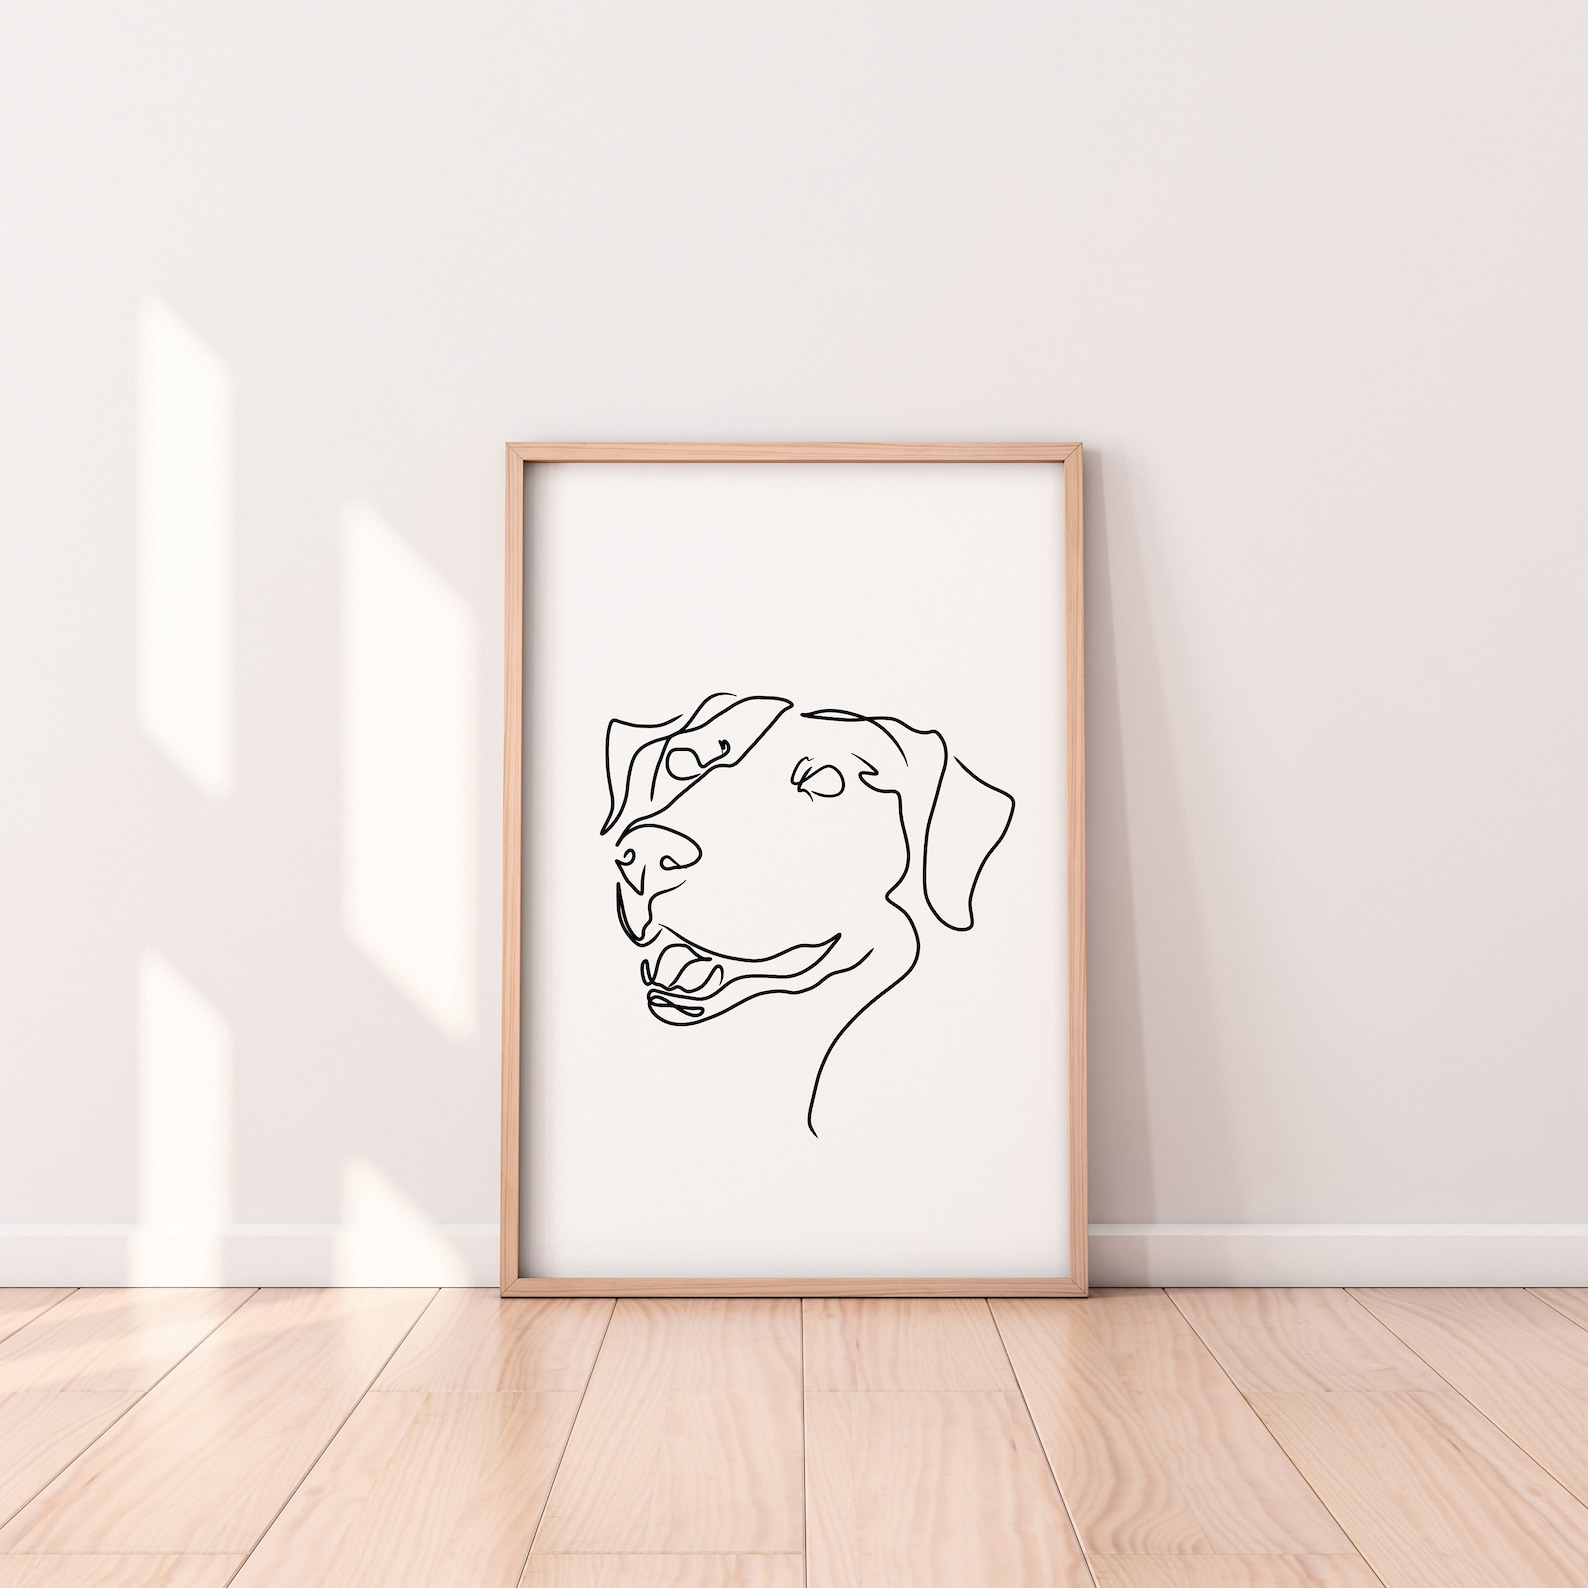 Minimalist style line art print with labrador dog